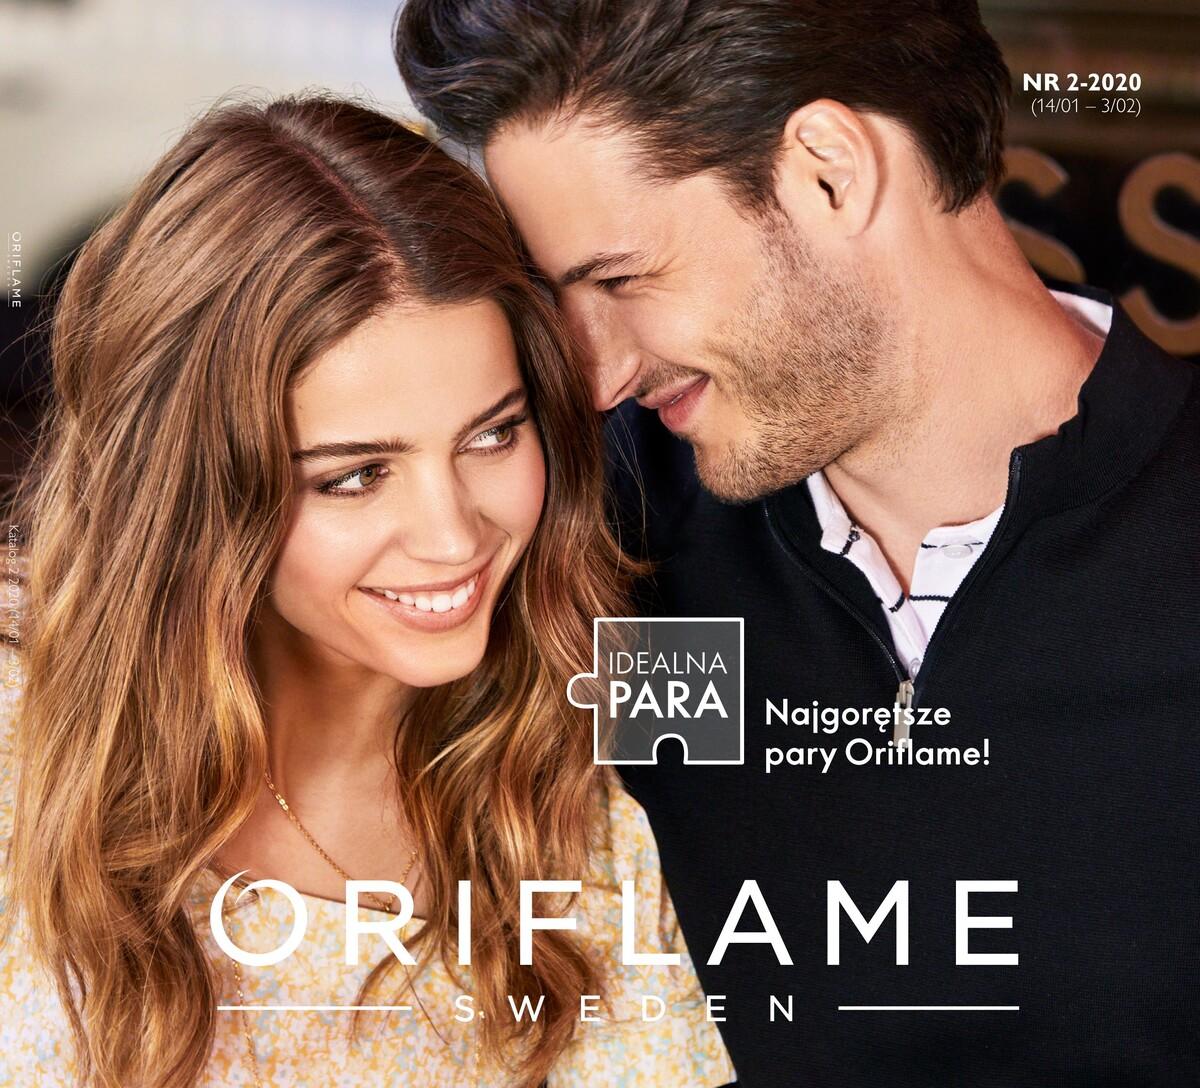 Gazetka Oriflame - Katalog nr 02-2020